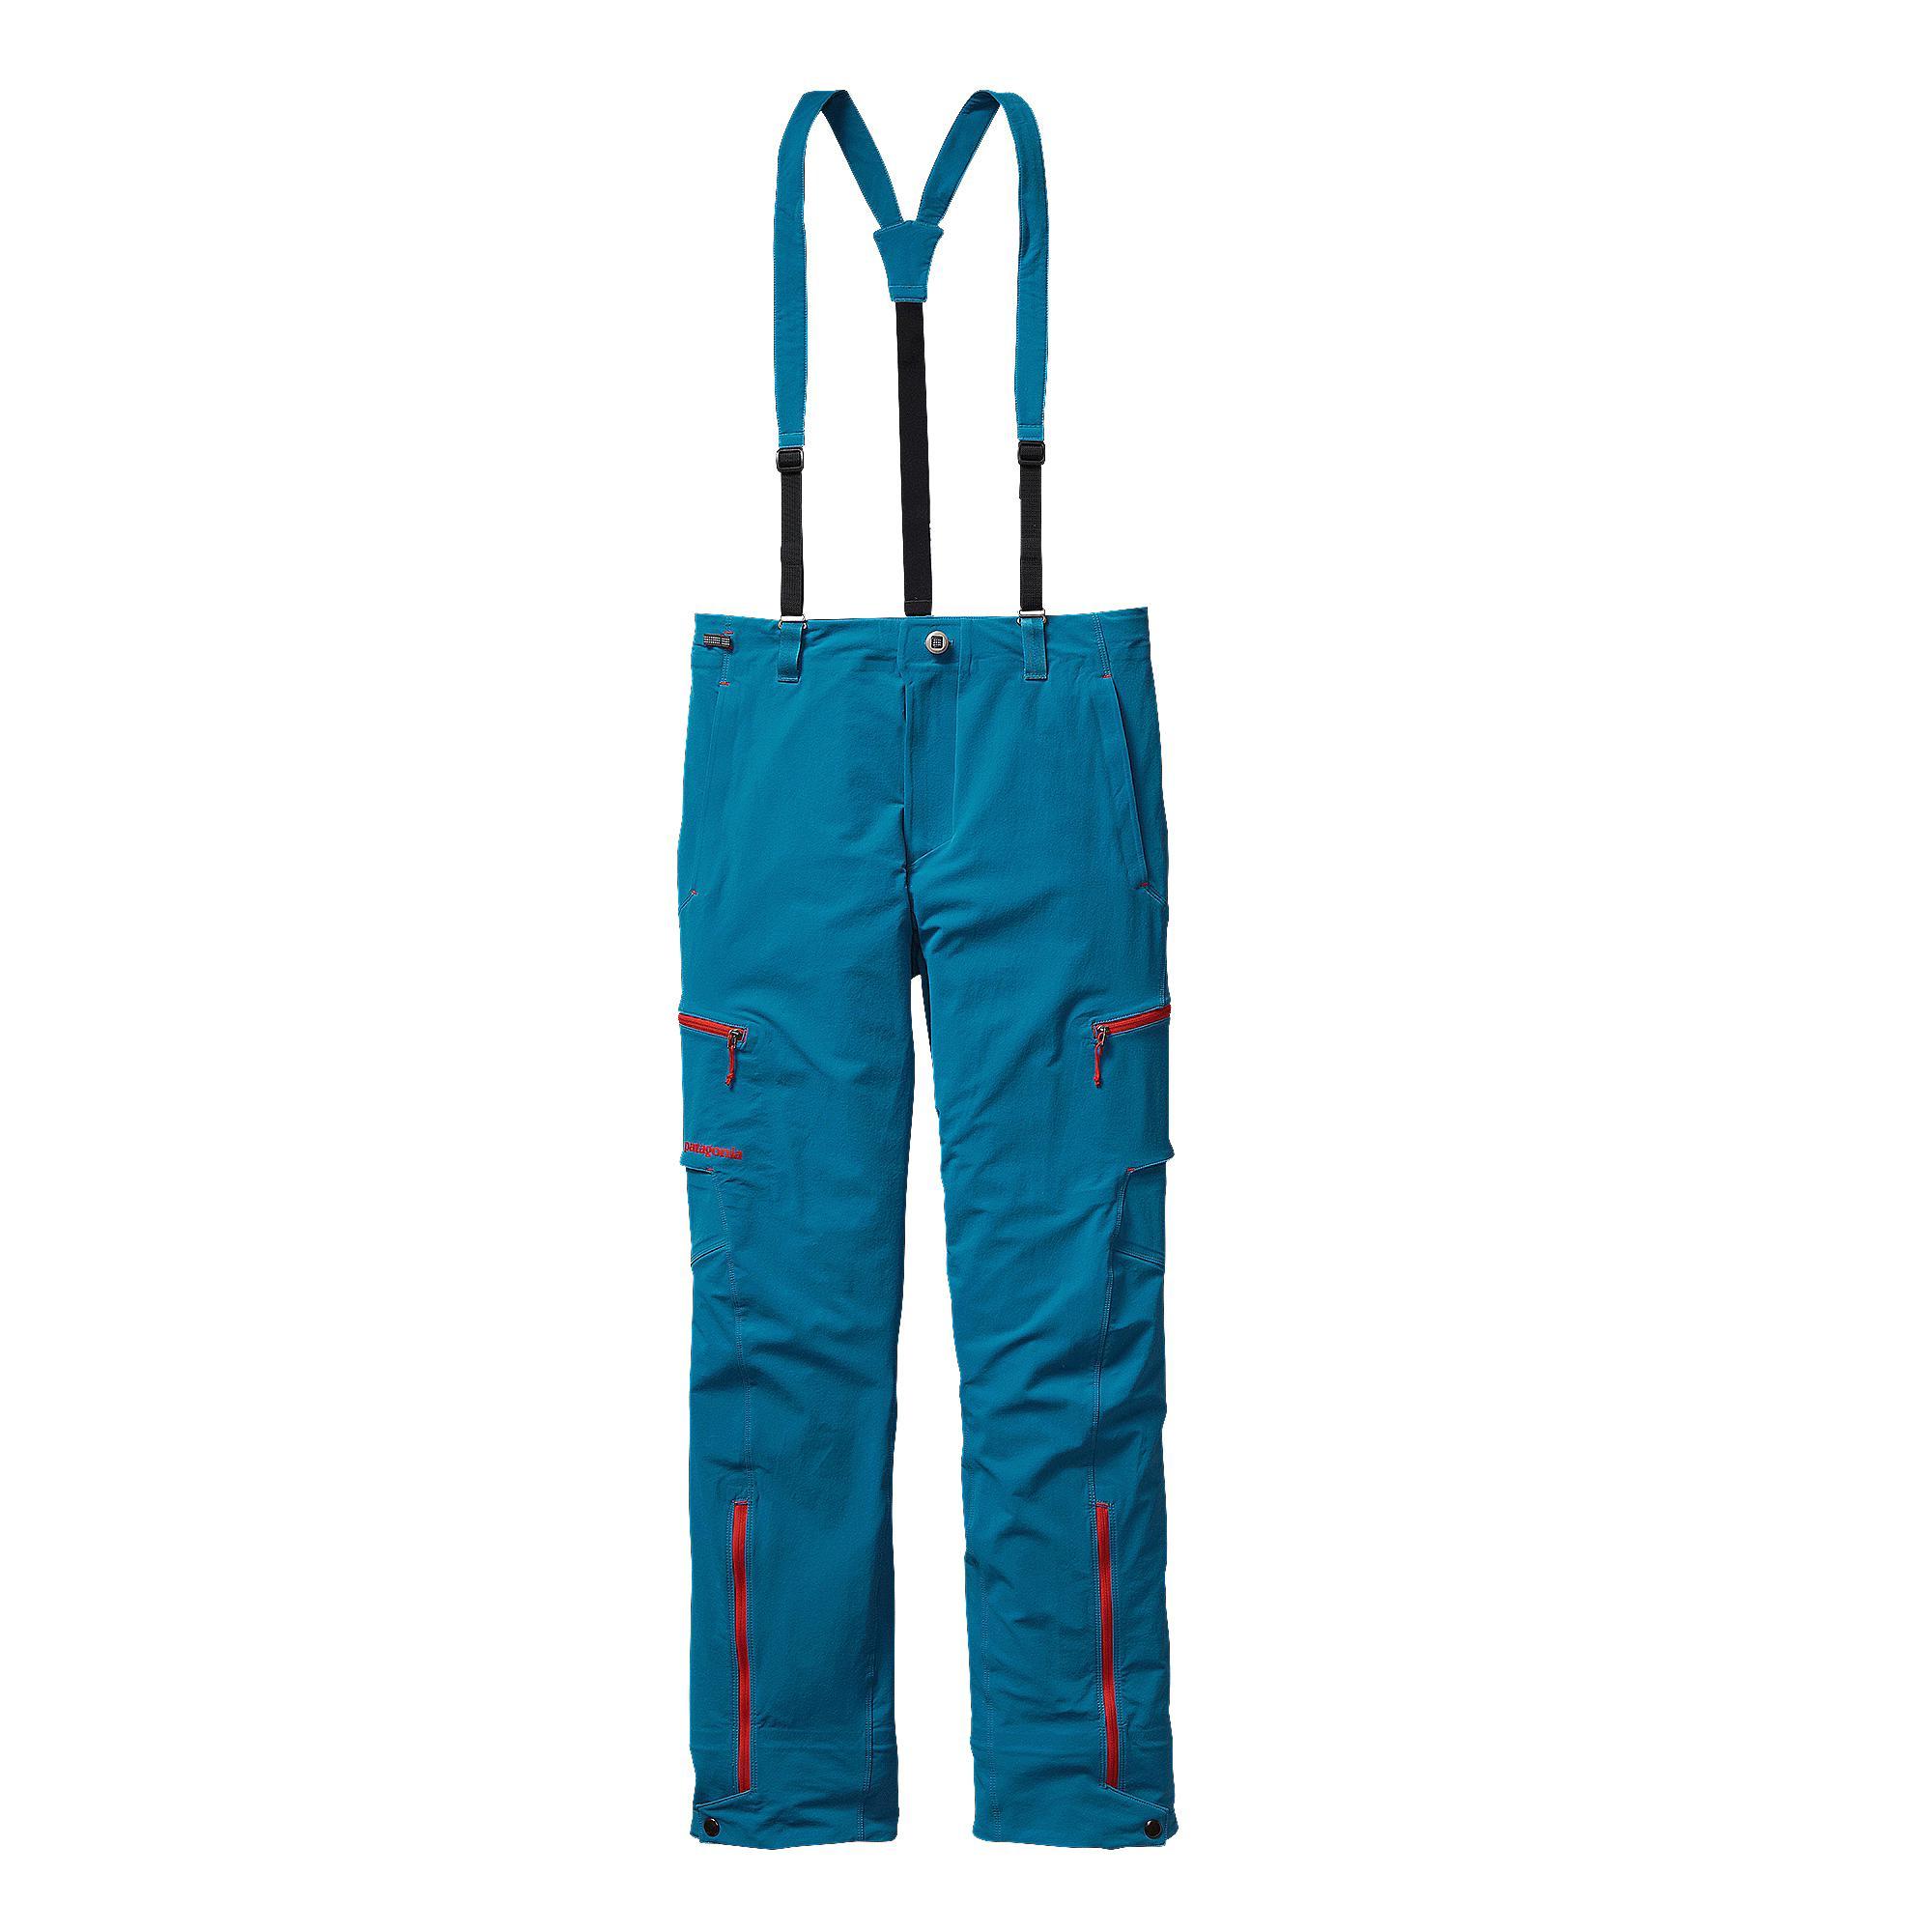 Patagonia Men's Dual Point Alpine Pants